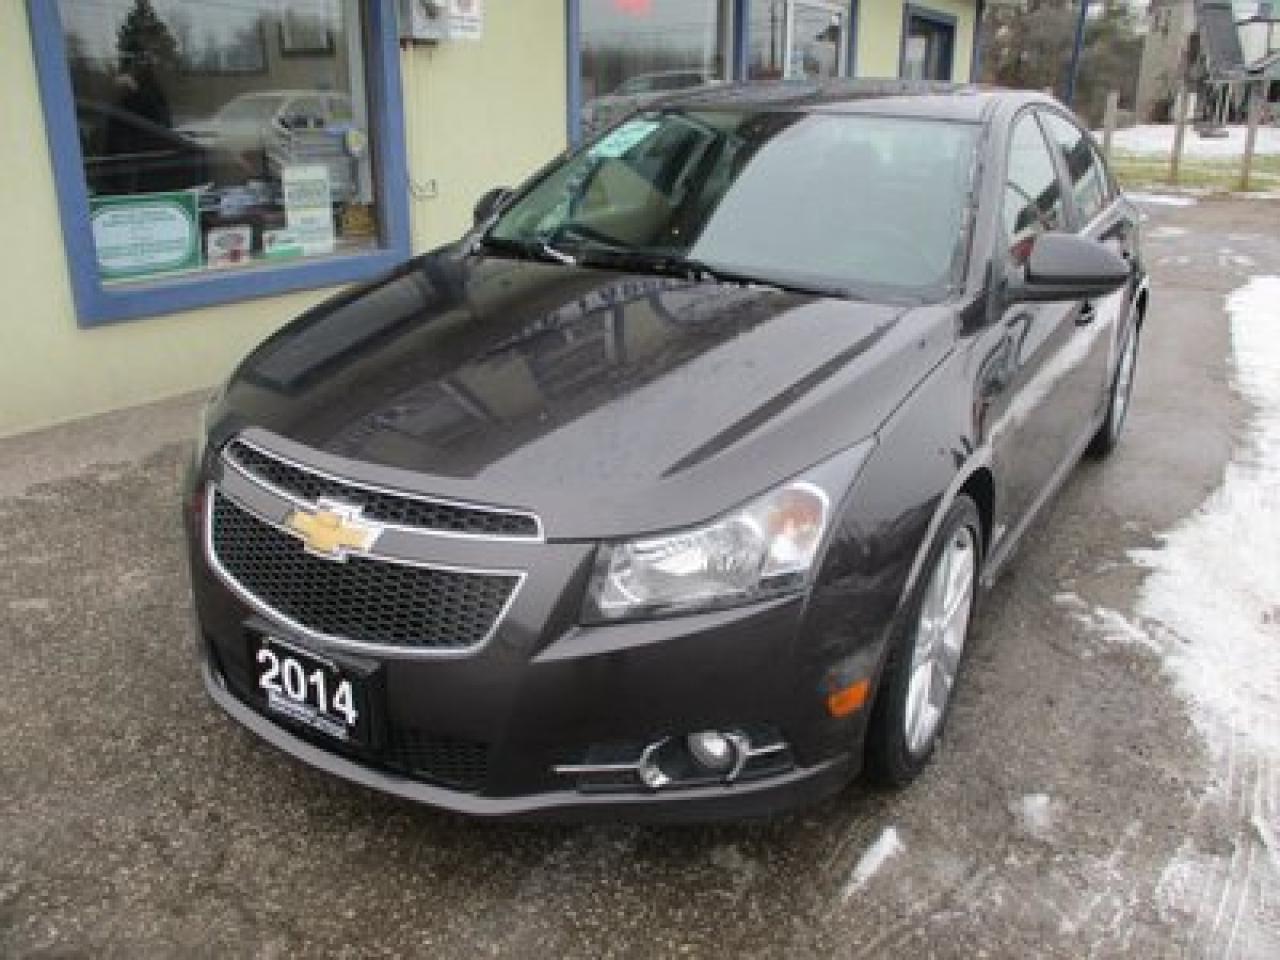 2014 Chevrolet Cruze LOADED 2-LT MODEL 5 PASSENGER 1.4L - TURBO.. LEATHER.. HEATED SEATS.. NAVIGATION.. SUNROOF.. BACK-UP CAMERA..